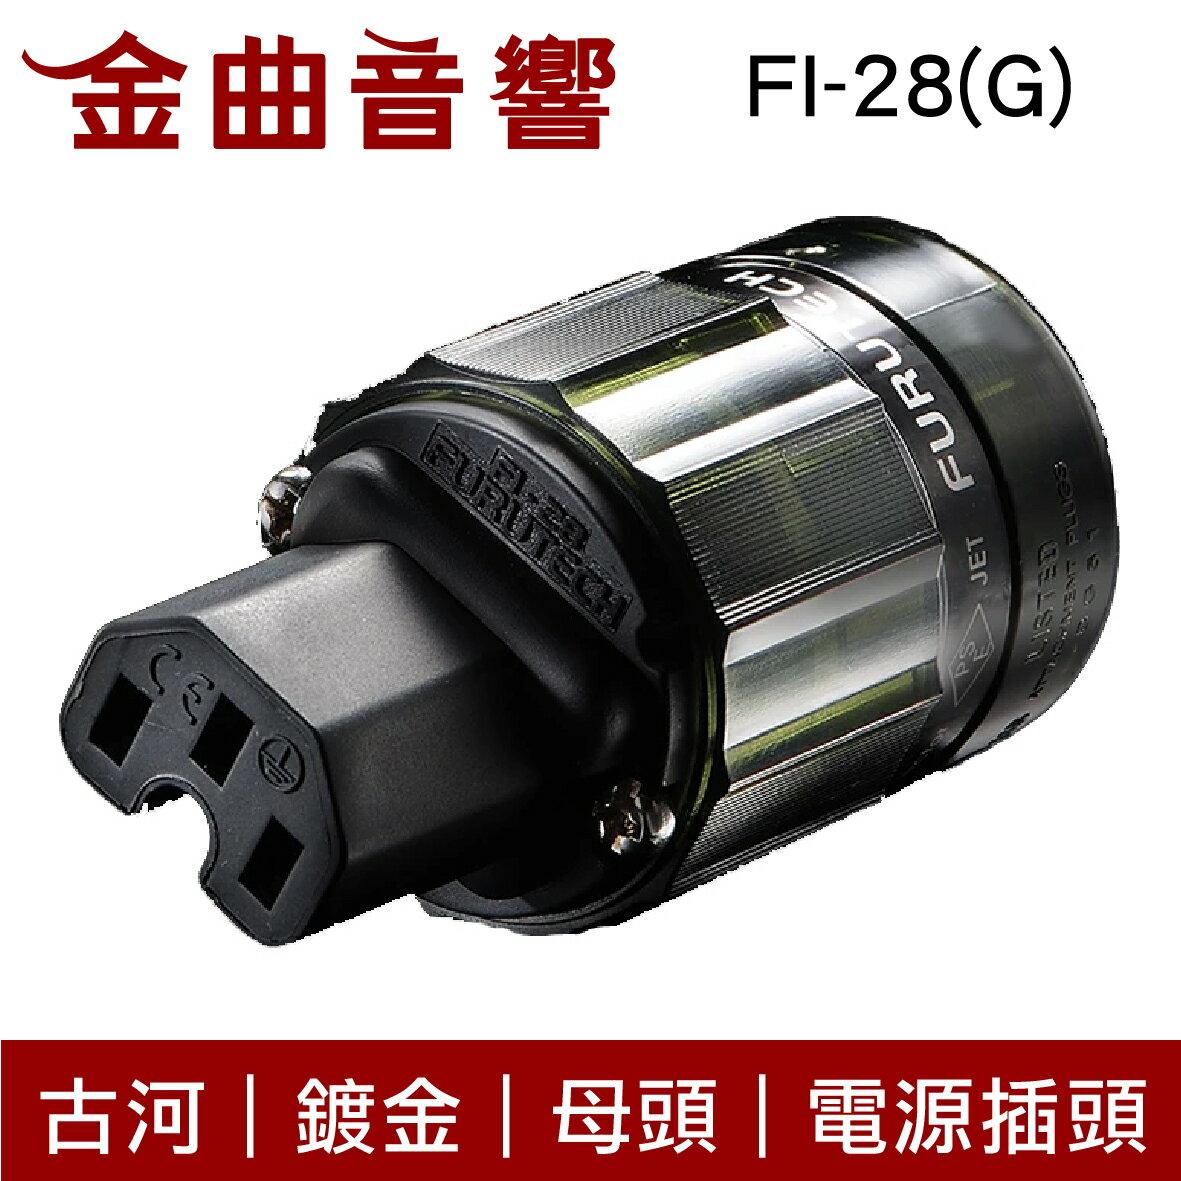 FURUTECH 古河 FI-28(G) 鍍金 母頭 電源插頭 | 金曲音響